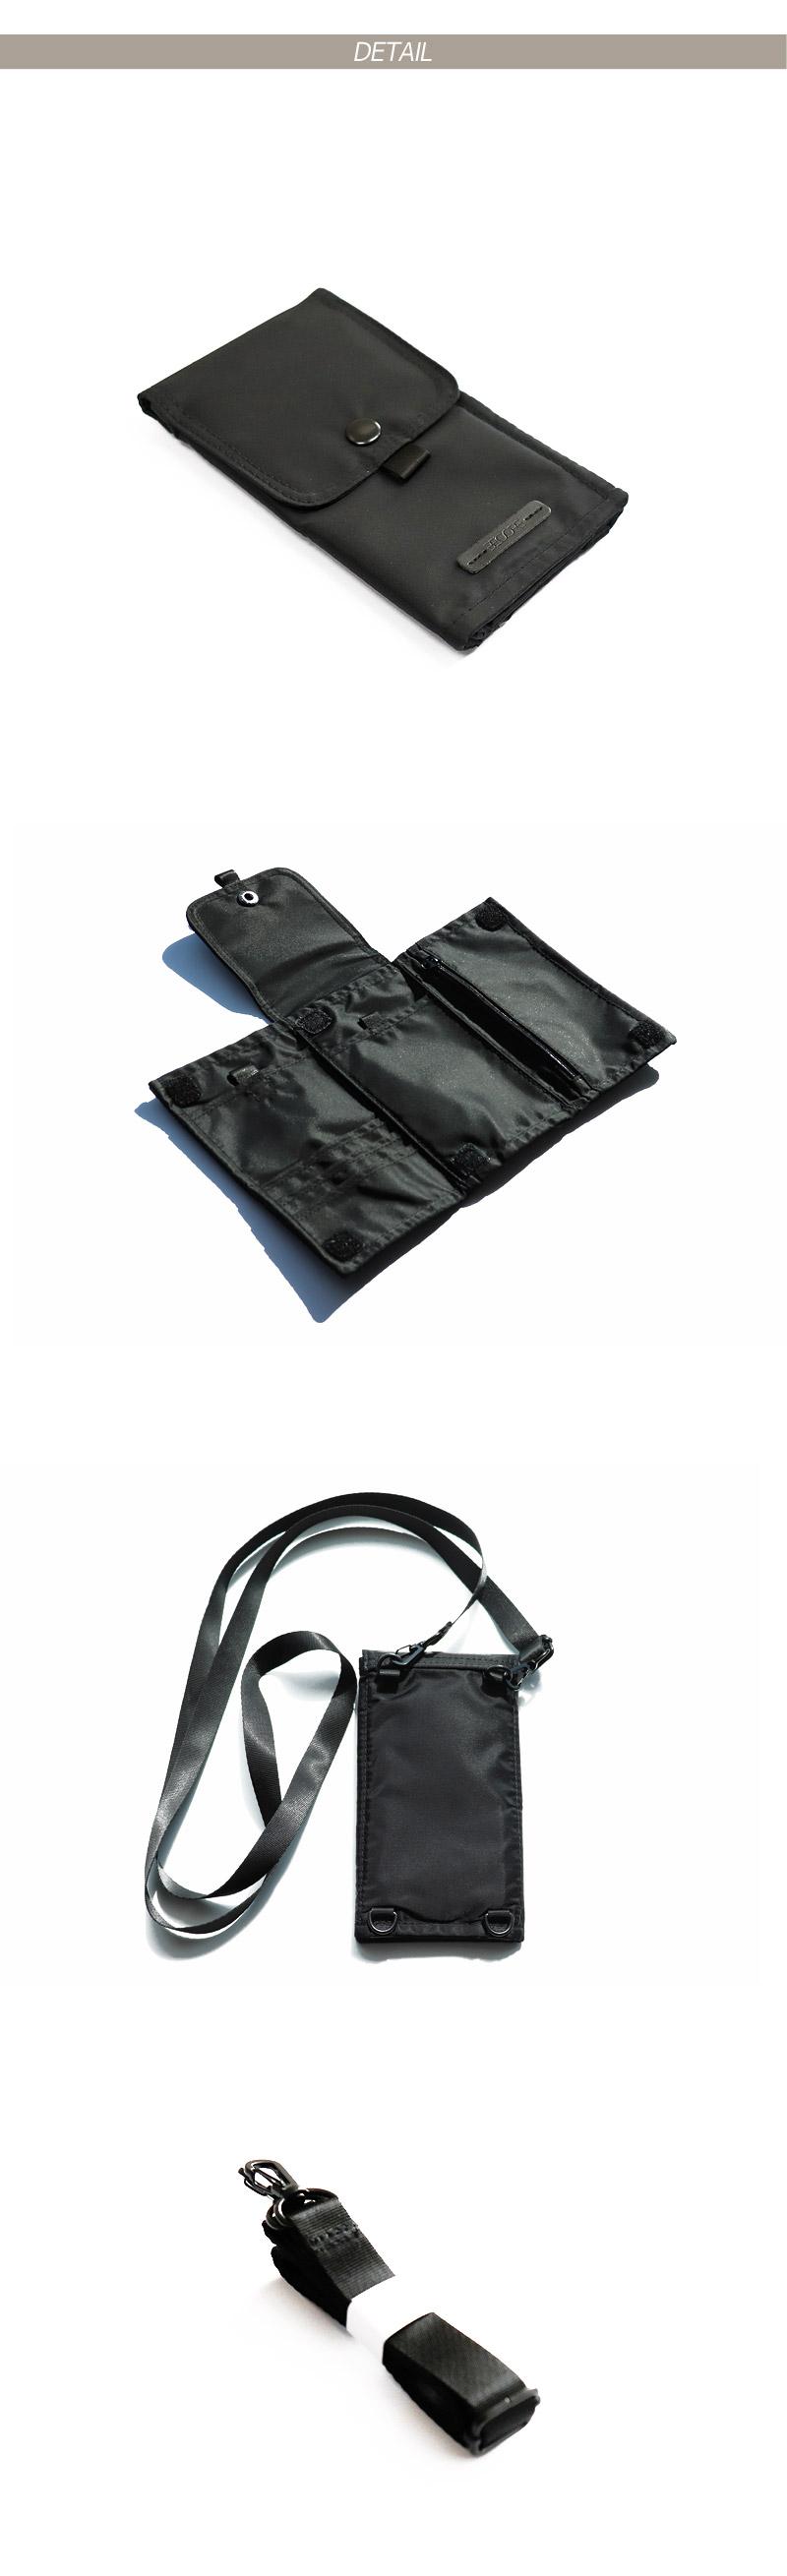 Becore 3 Fold Phone Sling Bag(휴대폰가방) 12,000원-비코어패션잡화, 가방, 힙색, 패브릭바보사랑Becore 3 Fold Phone Sling Bag(휴대폰가방) 12,000원-비코어패션잡화, 가방, 힙색, 패브릭바보사랑